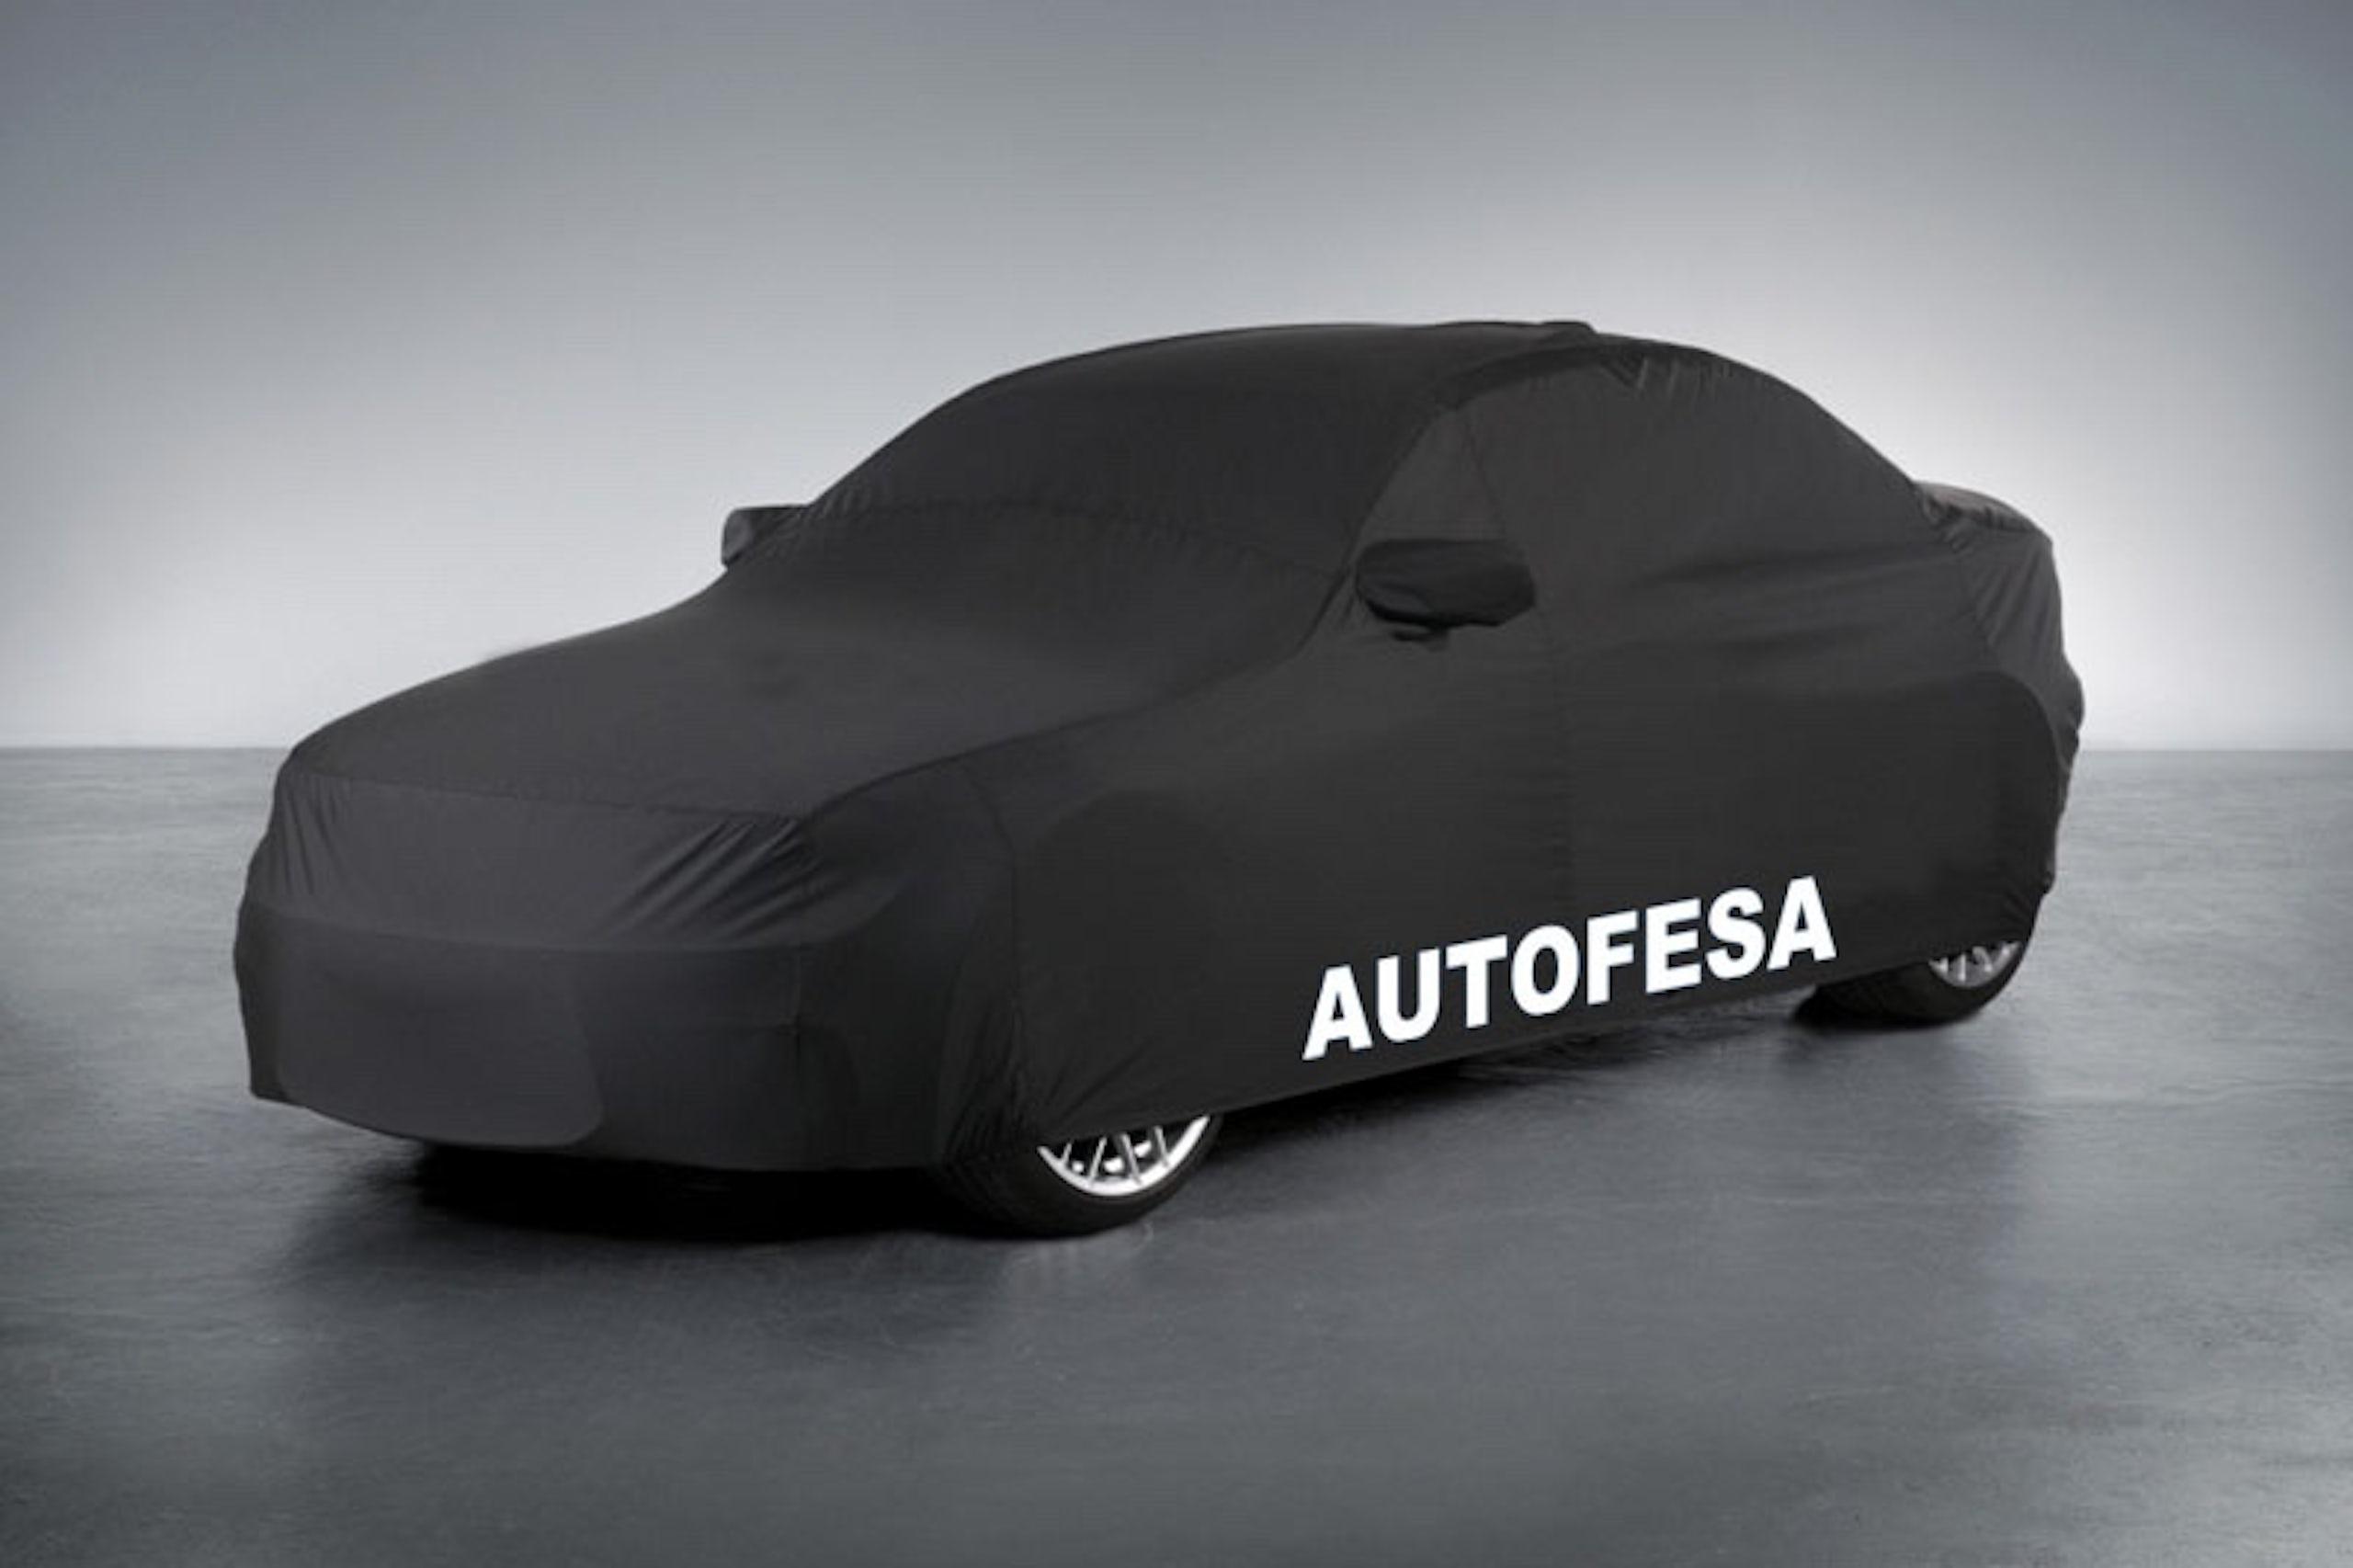 Lexus Nx 300h 300h 2.5 197cv Luxury 4WD 5p CVT Auto - Foto 29